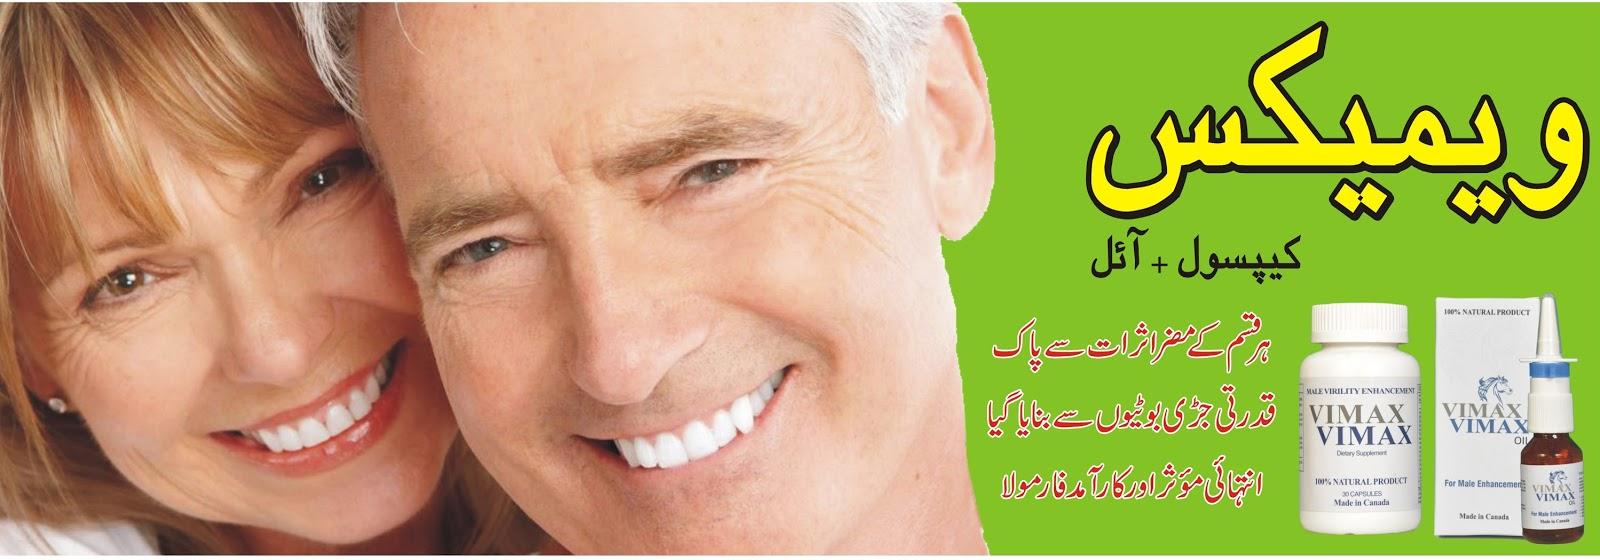 vimax oil in lahore pakistan